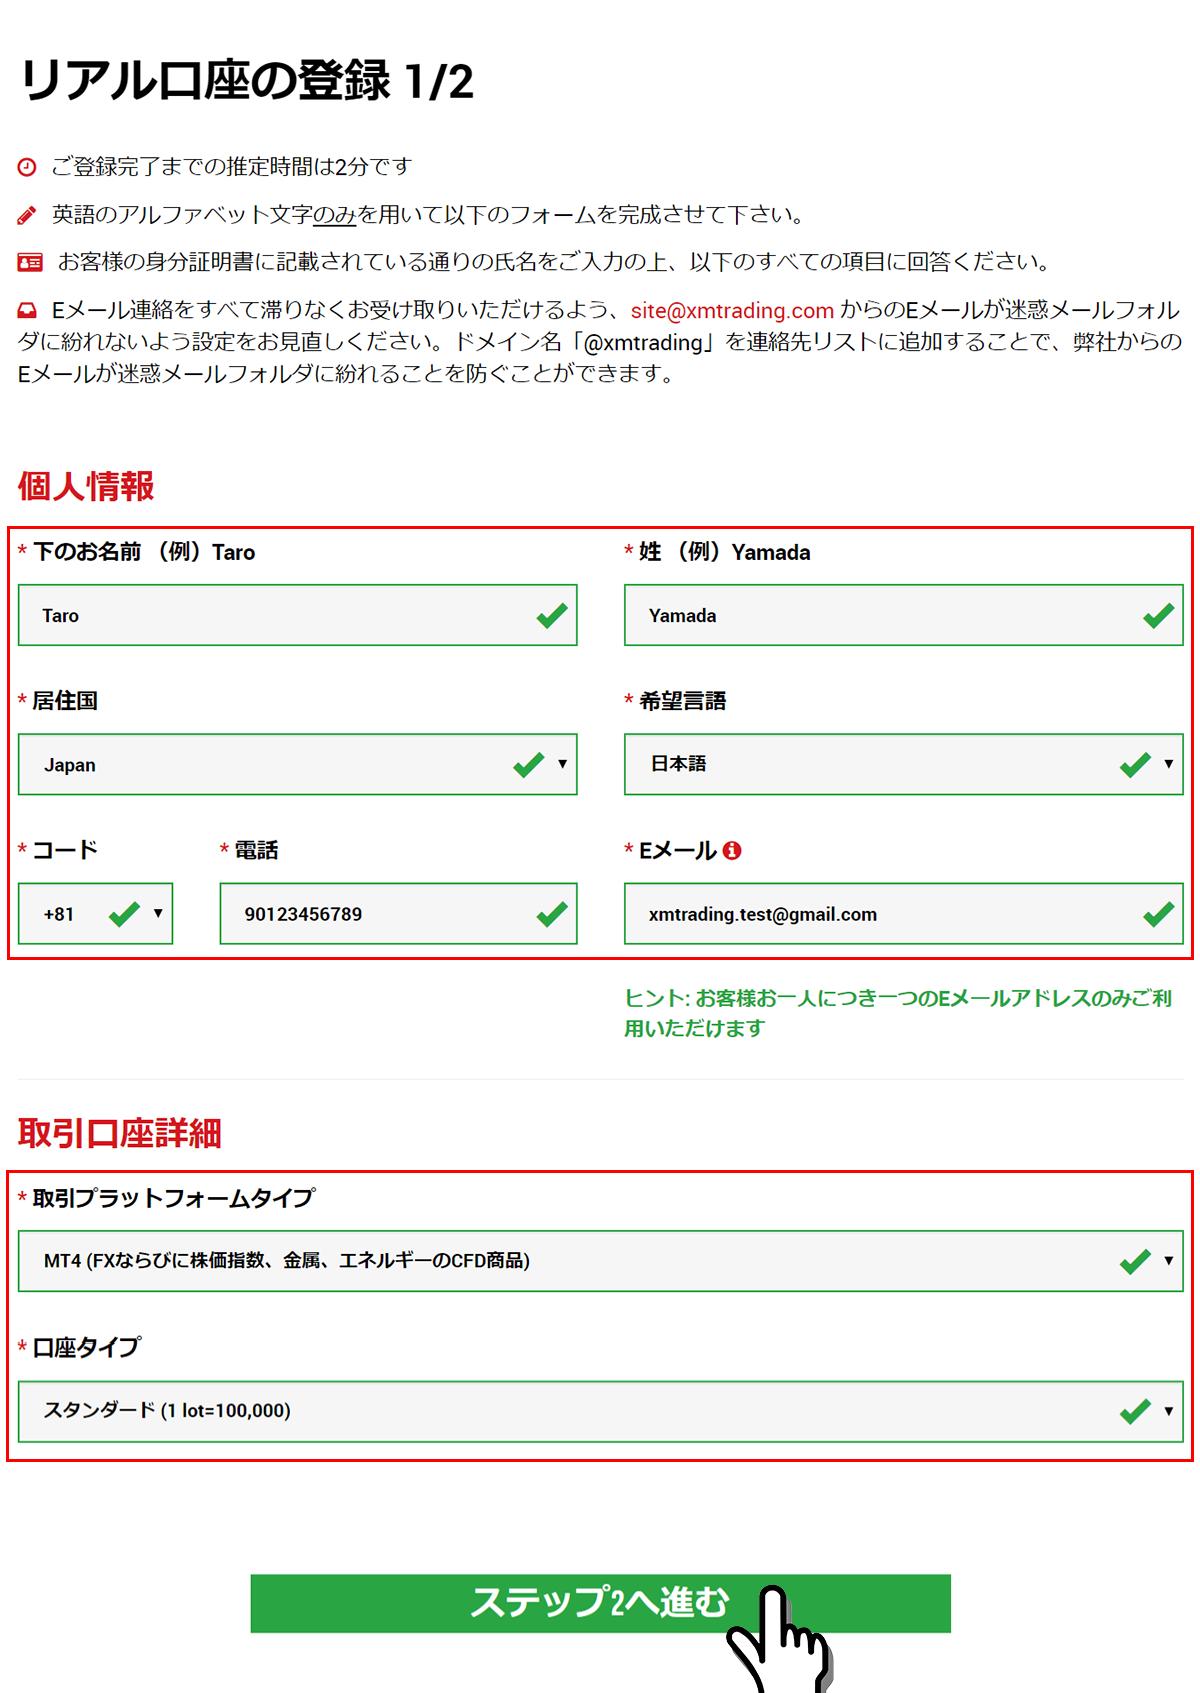 XMリアル口座登録フォーム 個人情報と取引口座詳細入力